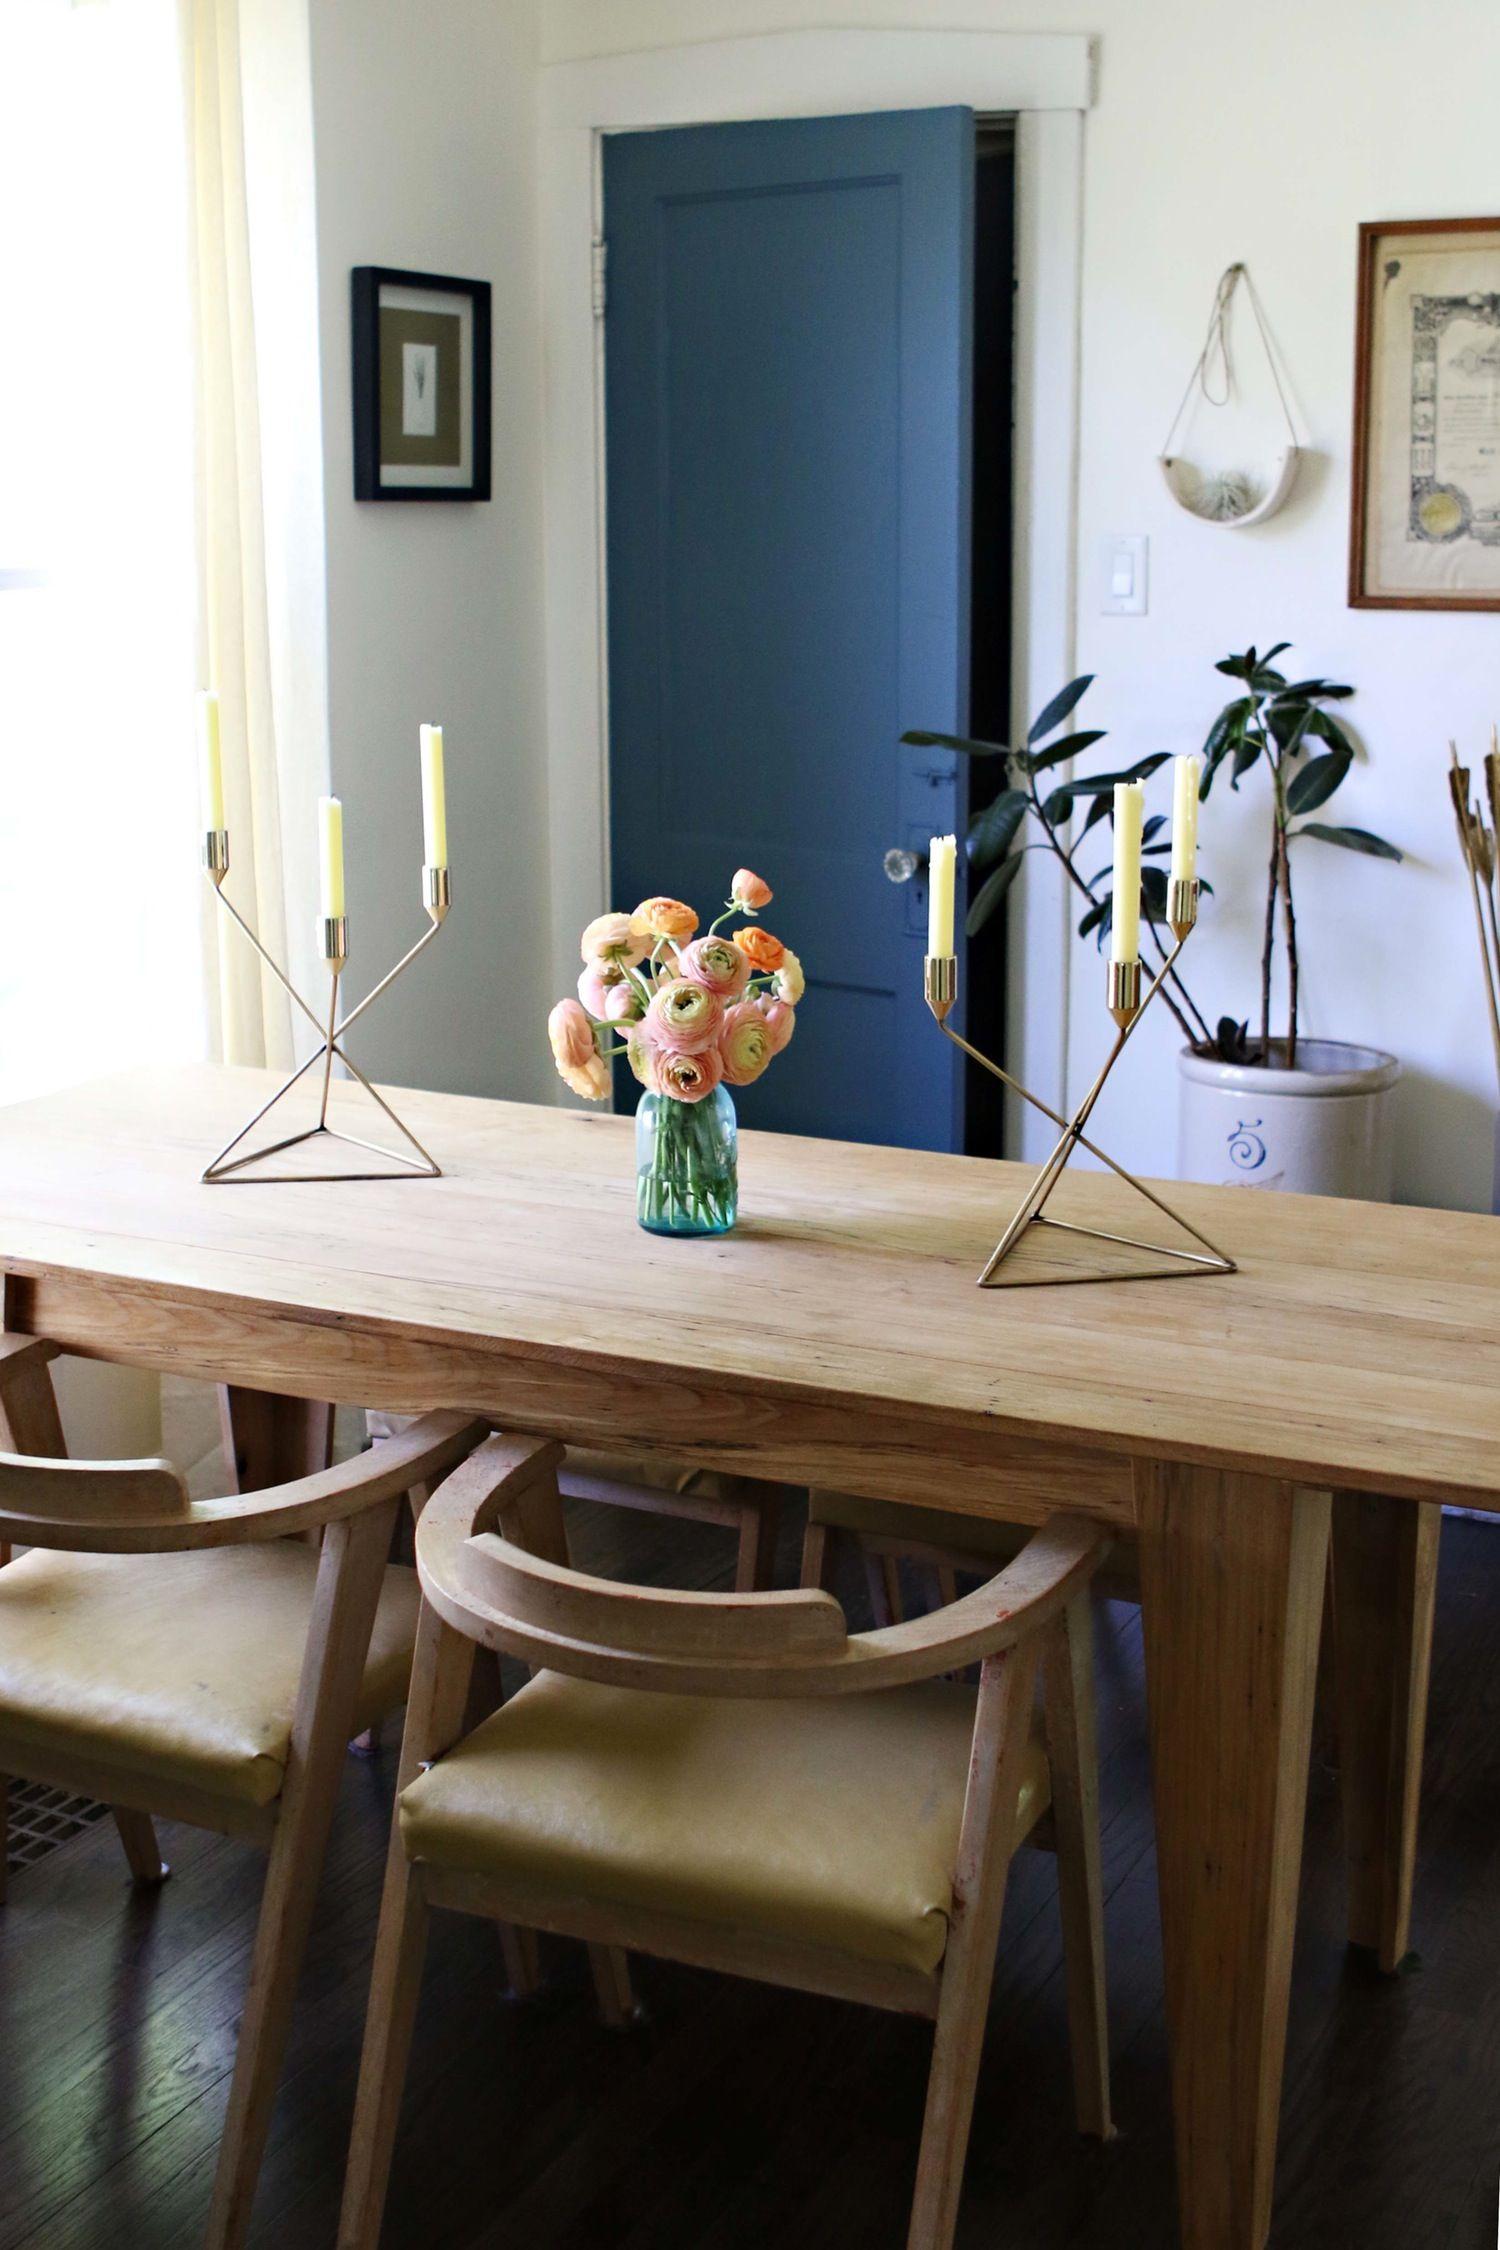 House tour a floristus cozy naturefilled chicago home house